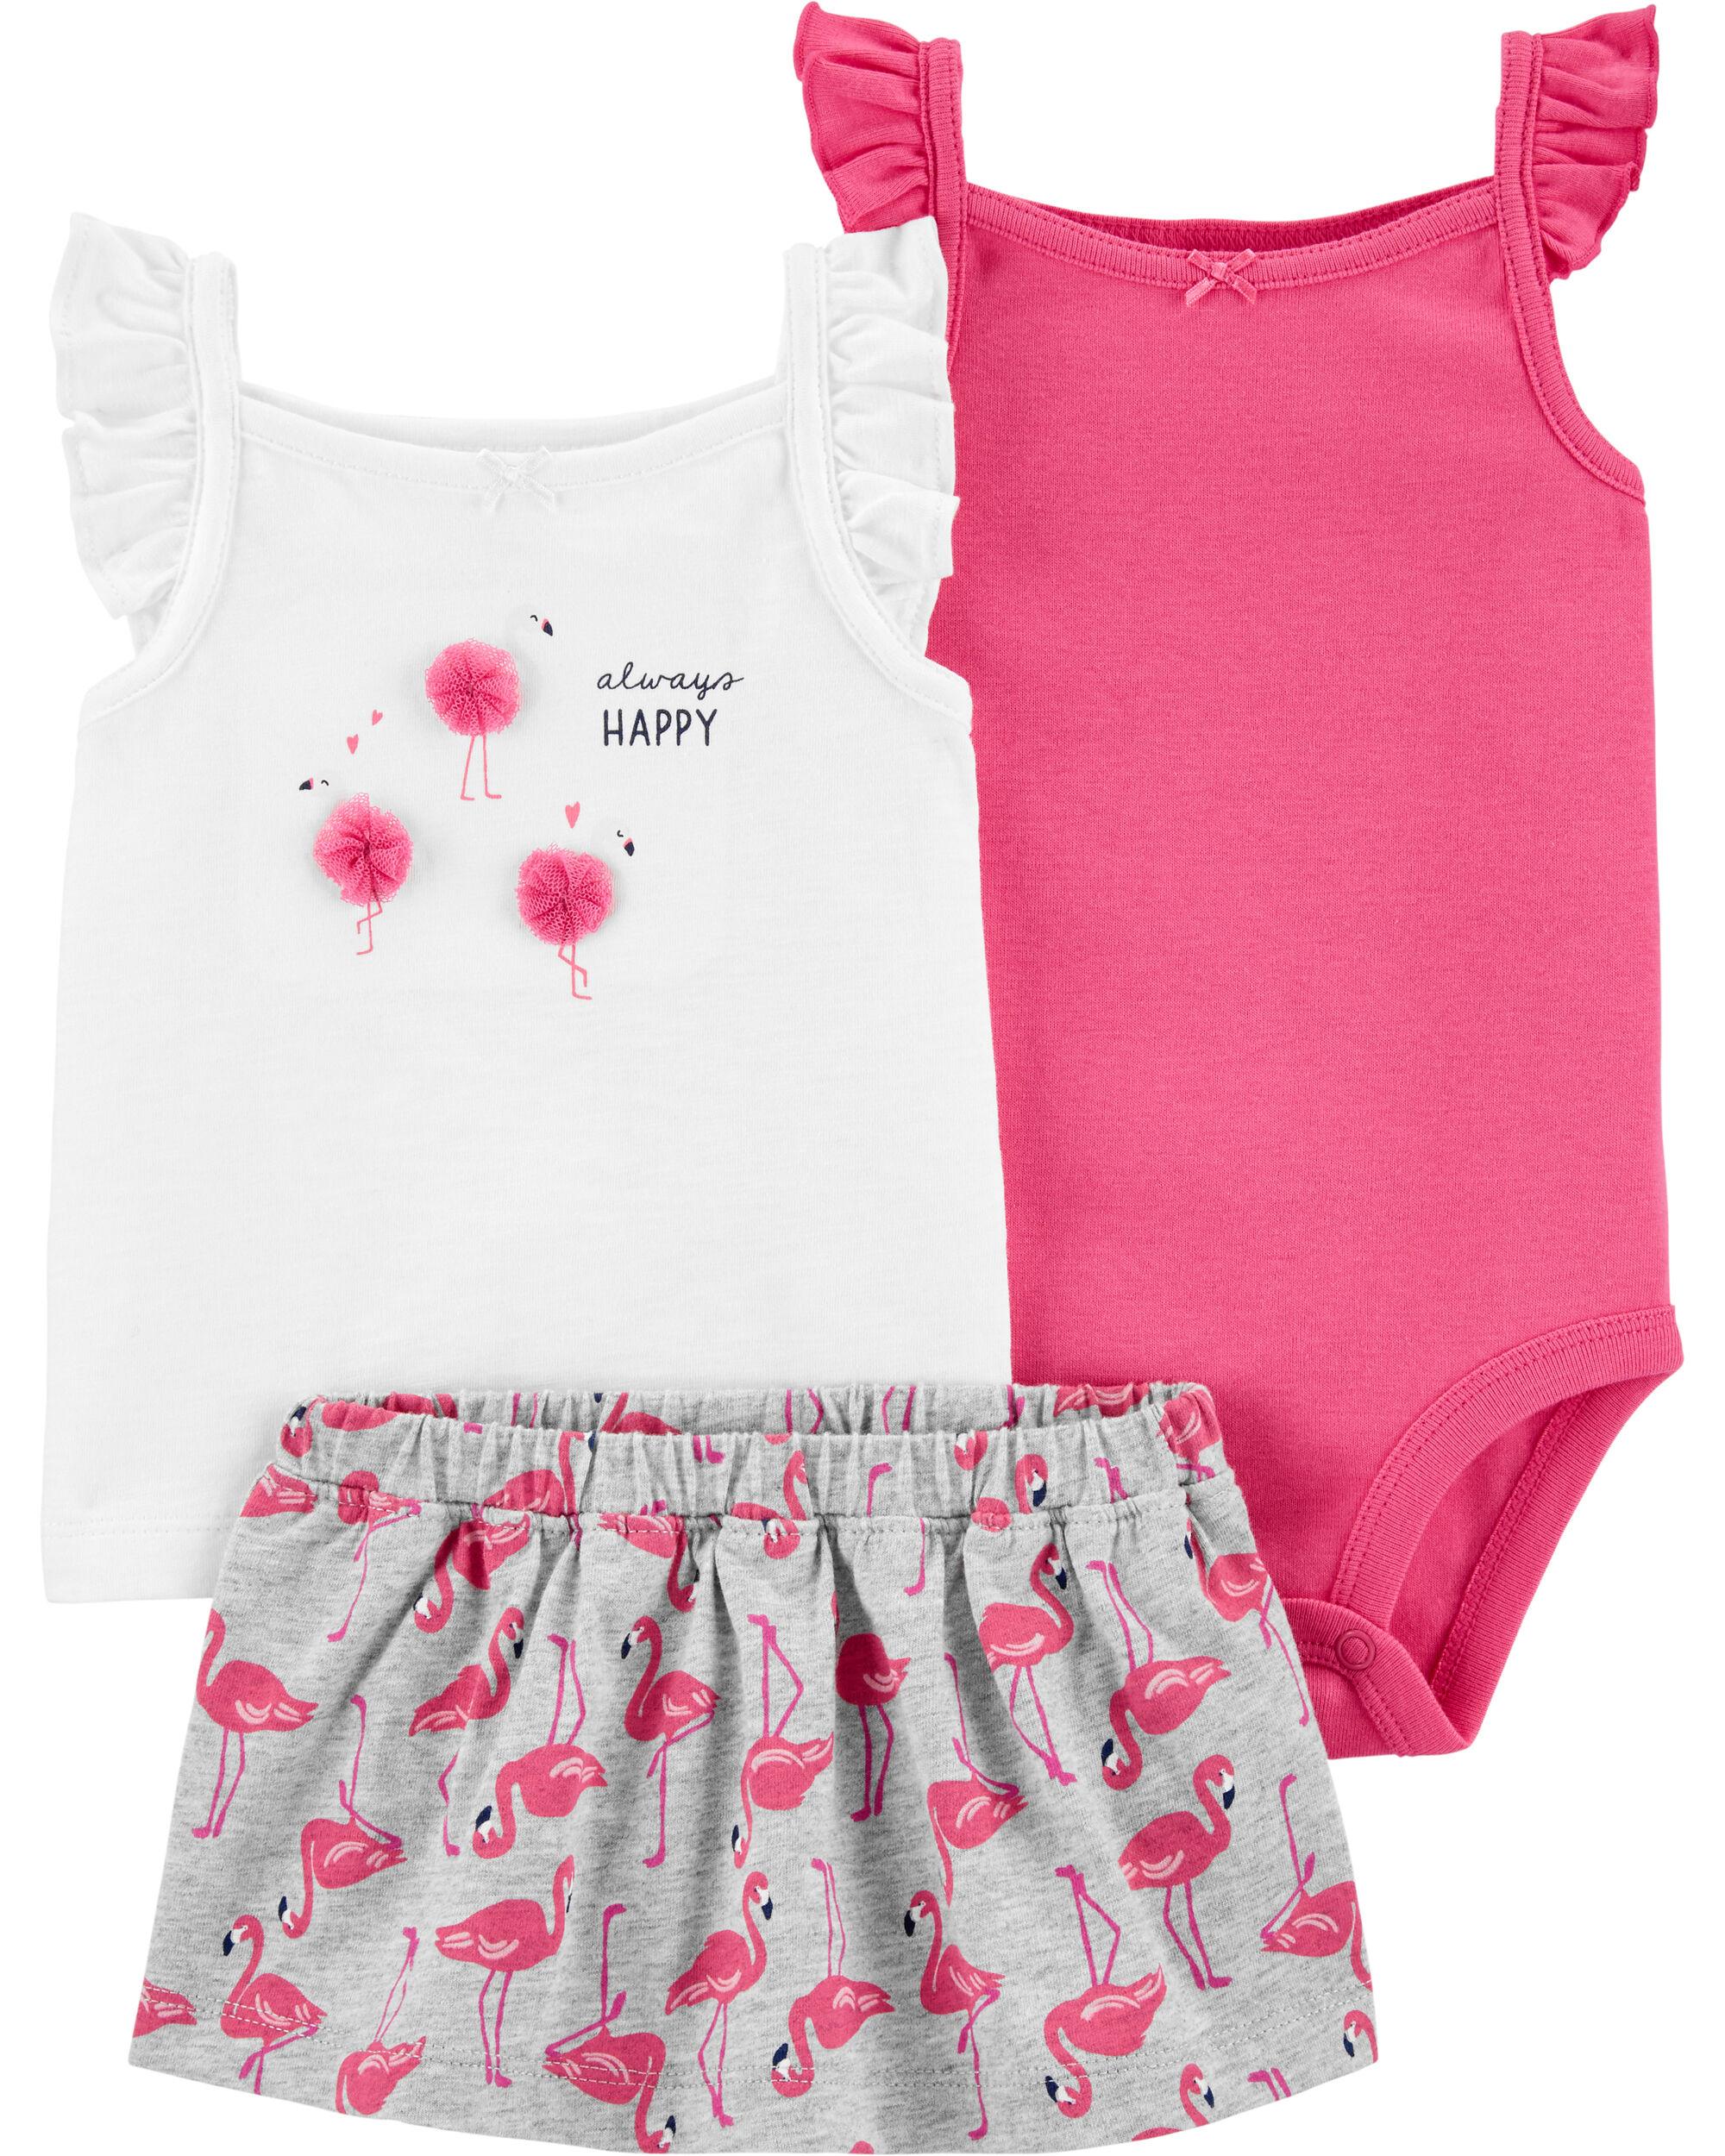 *CLEARANCE* 3-Piece Flamingo Little Skort Set